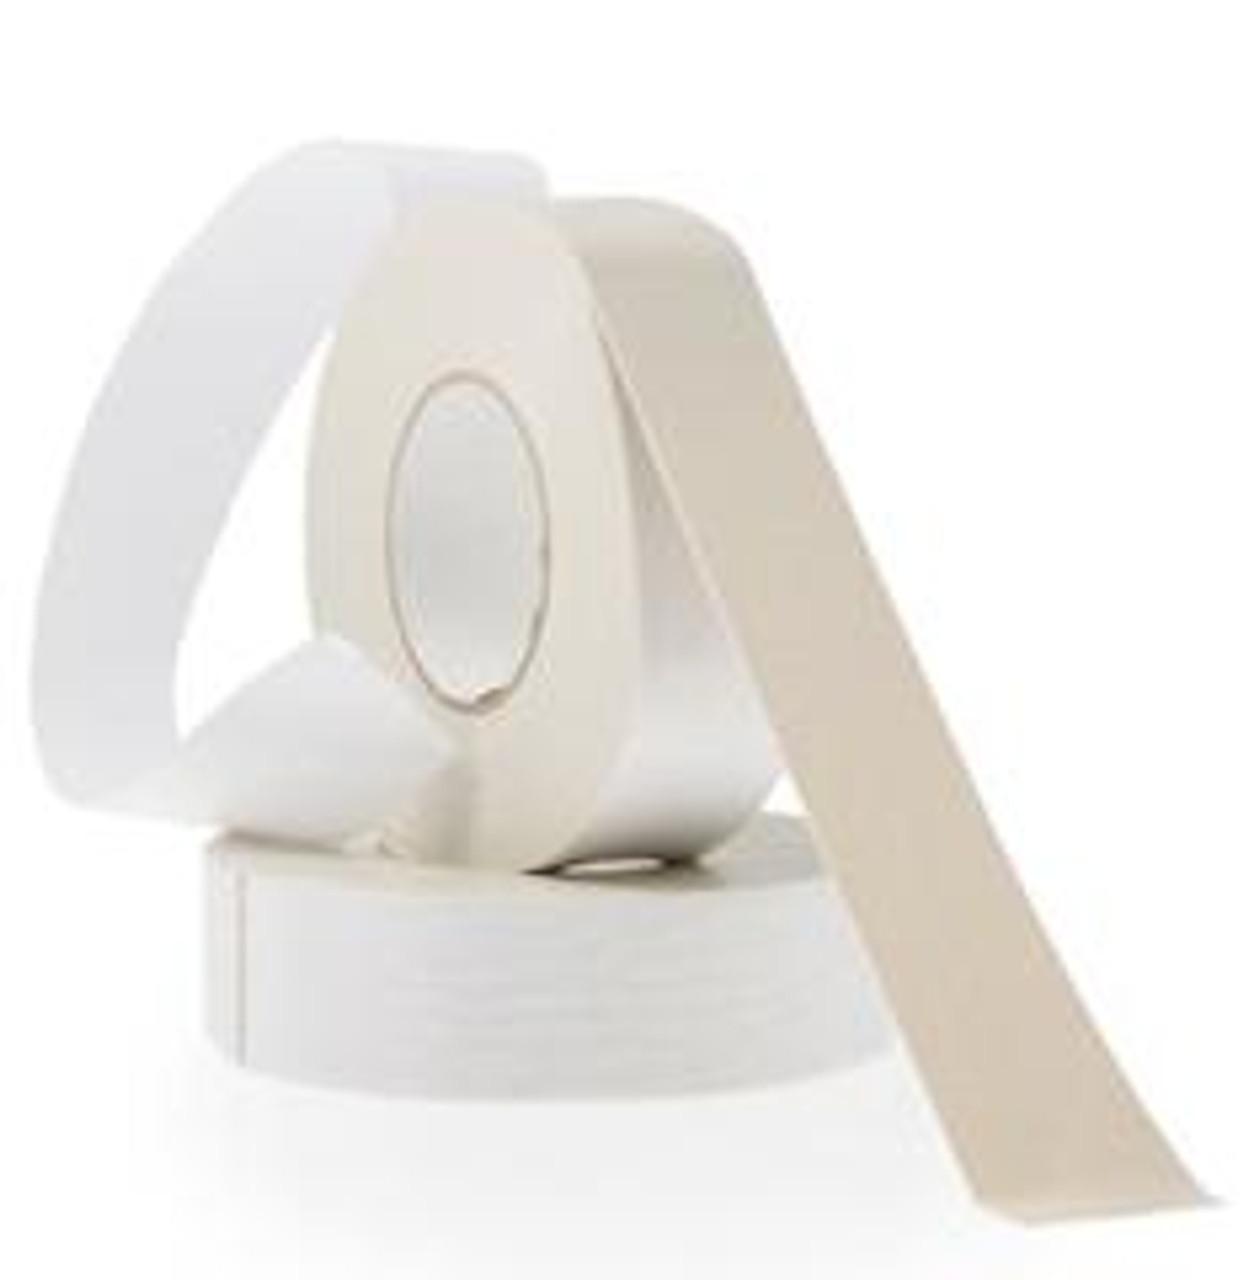 Butyl Tape - White 24mm x 15metres